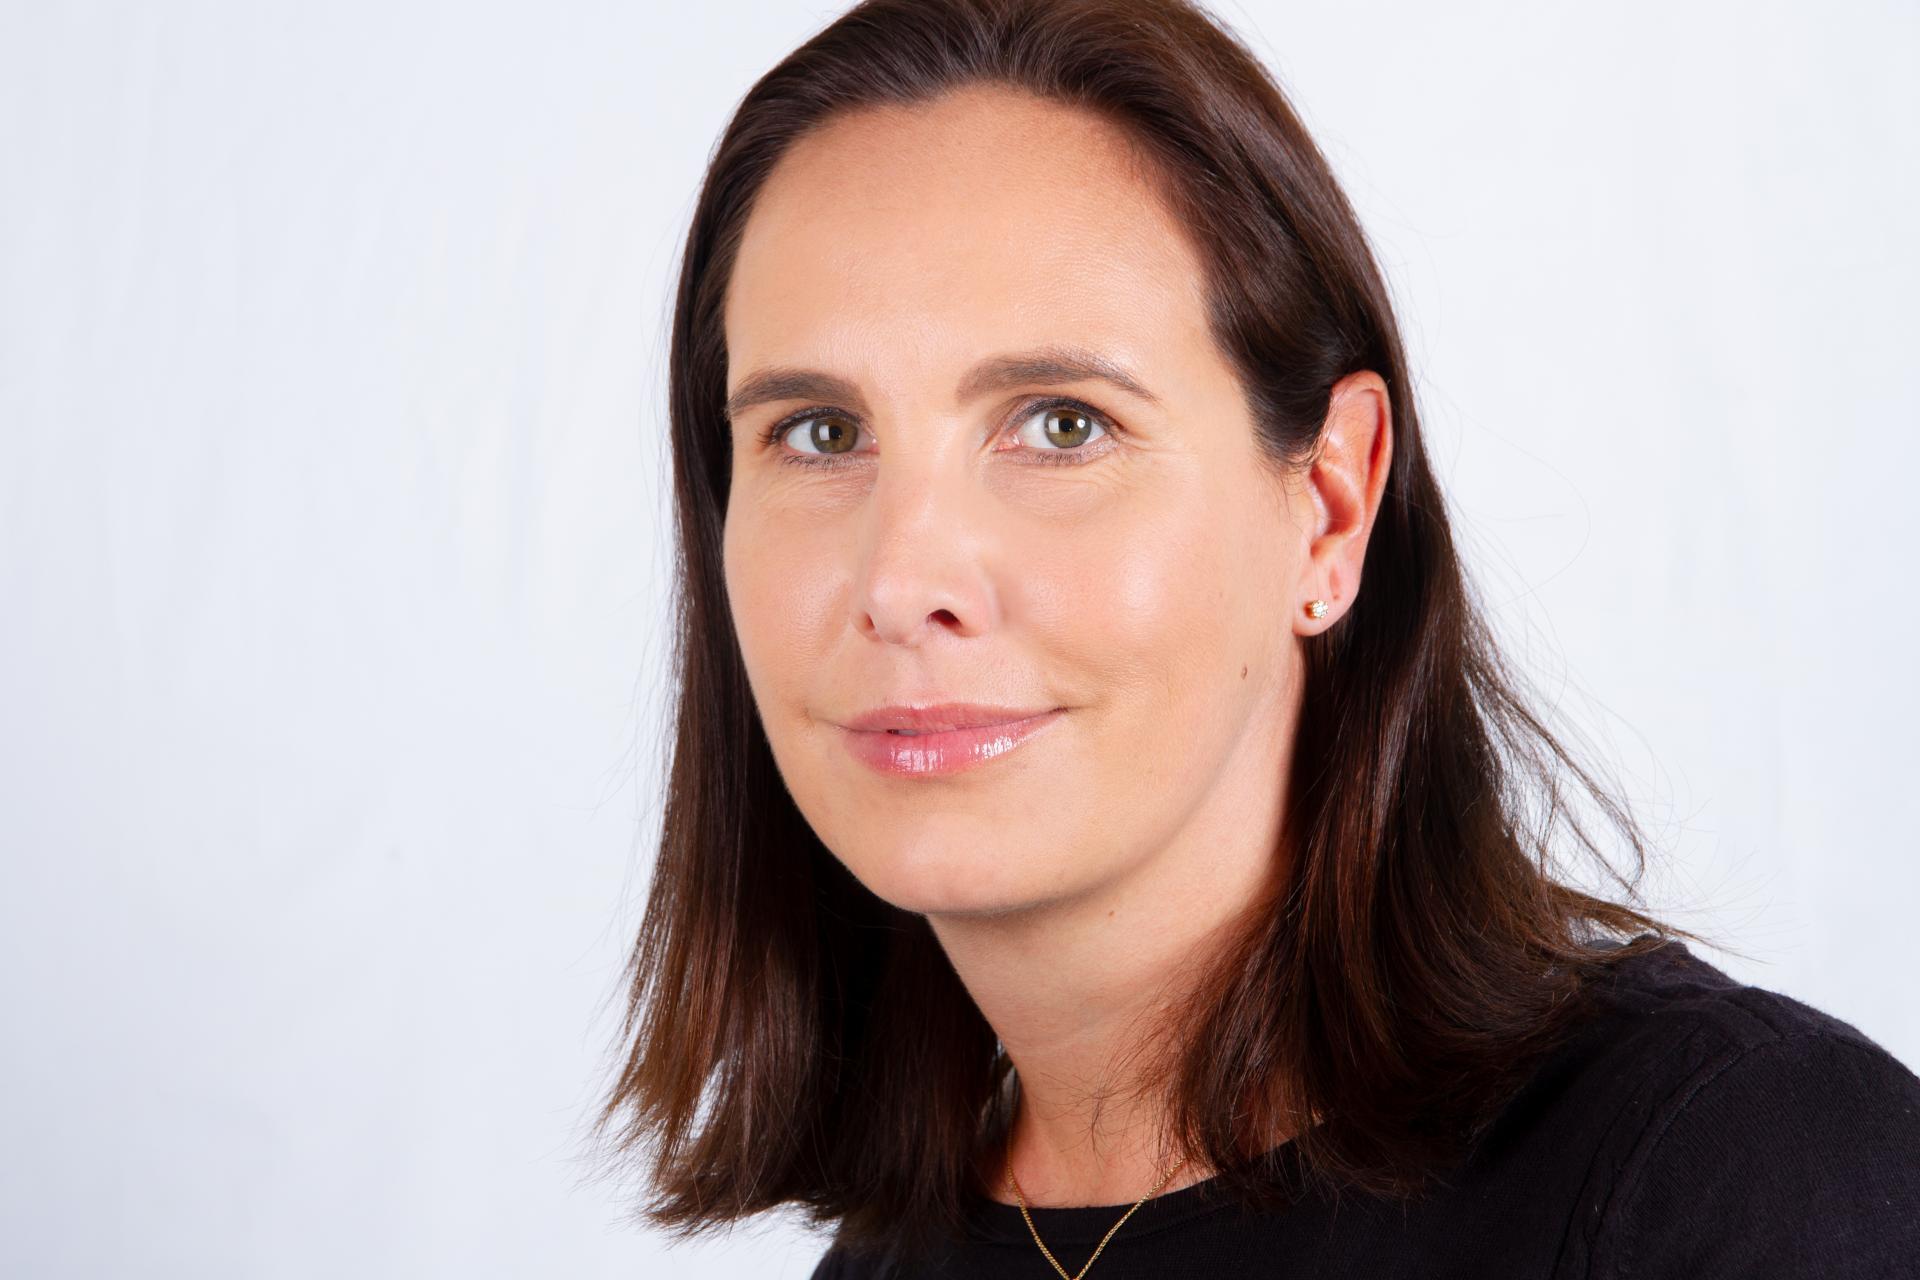 Julia Venohr